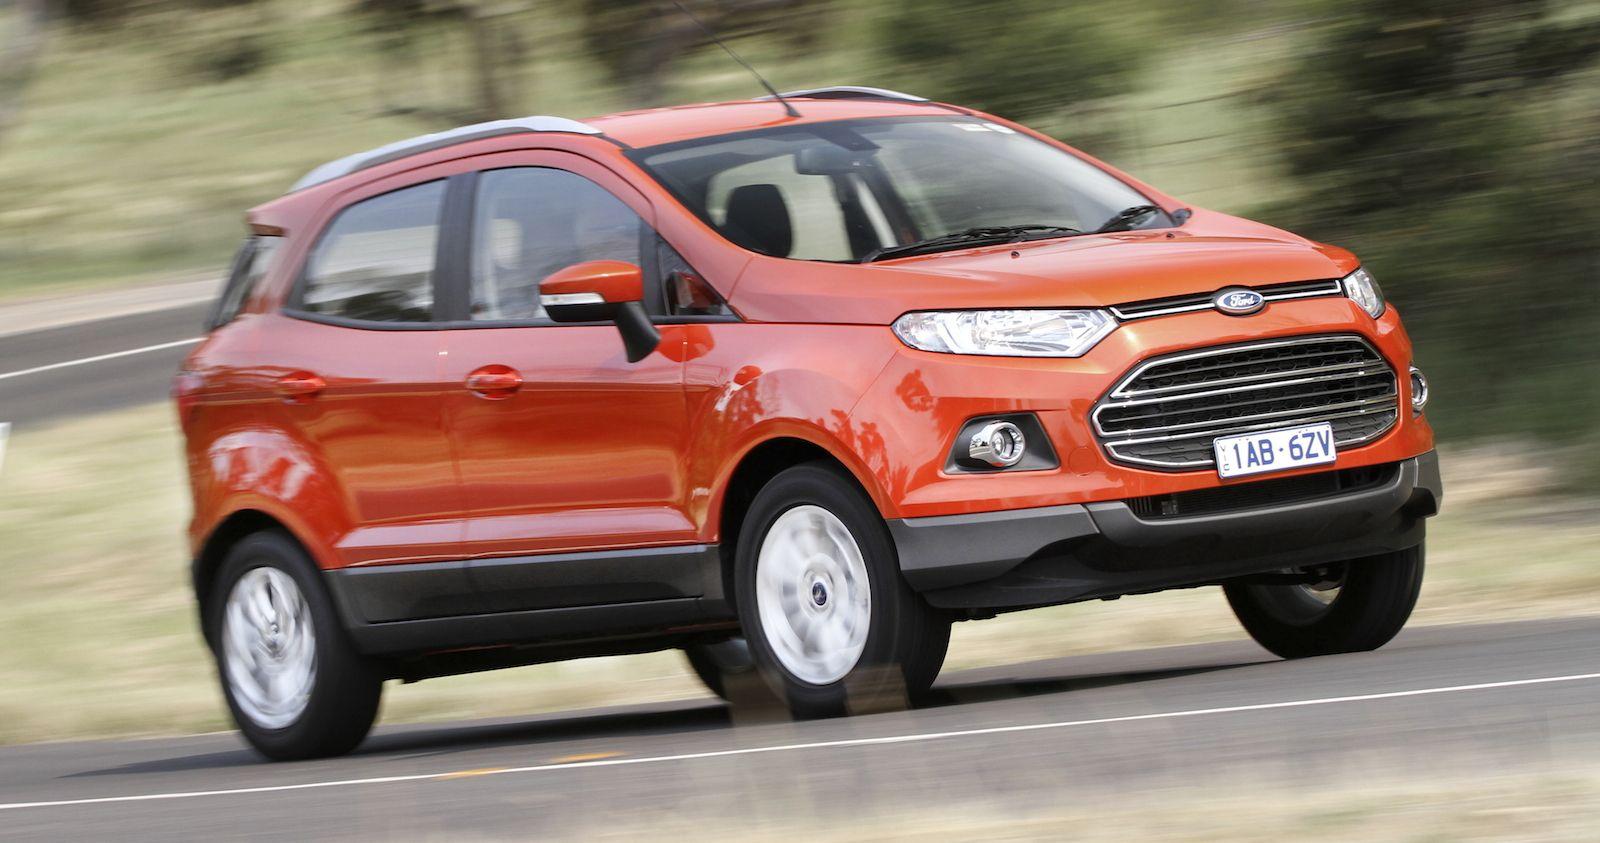 Ford Fiesta Focus Ecosport Warranties Extended Over Dual Clutch